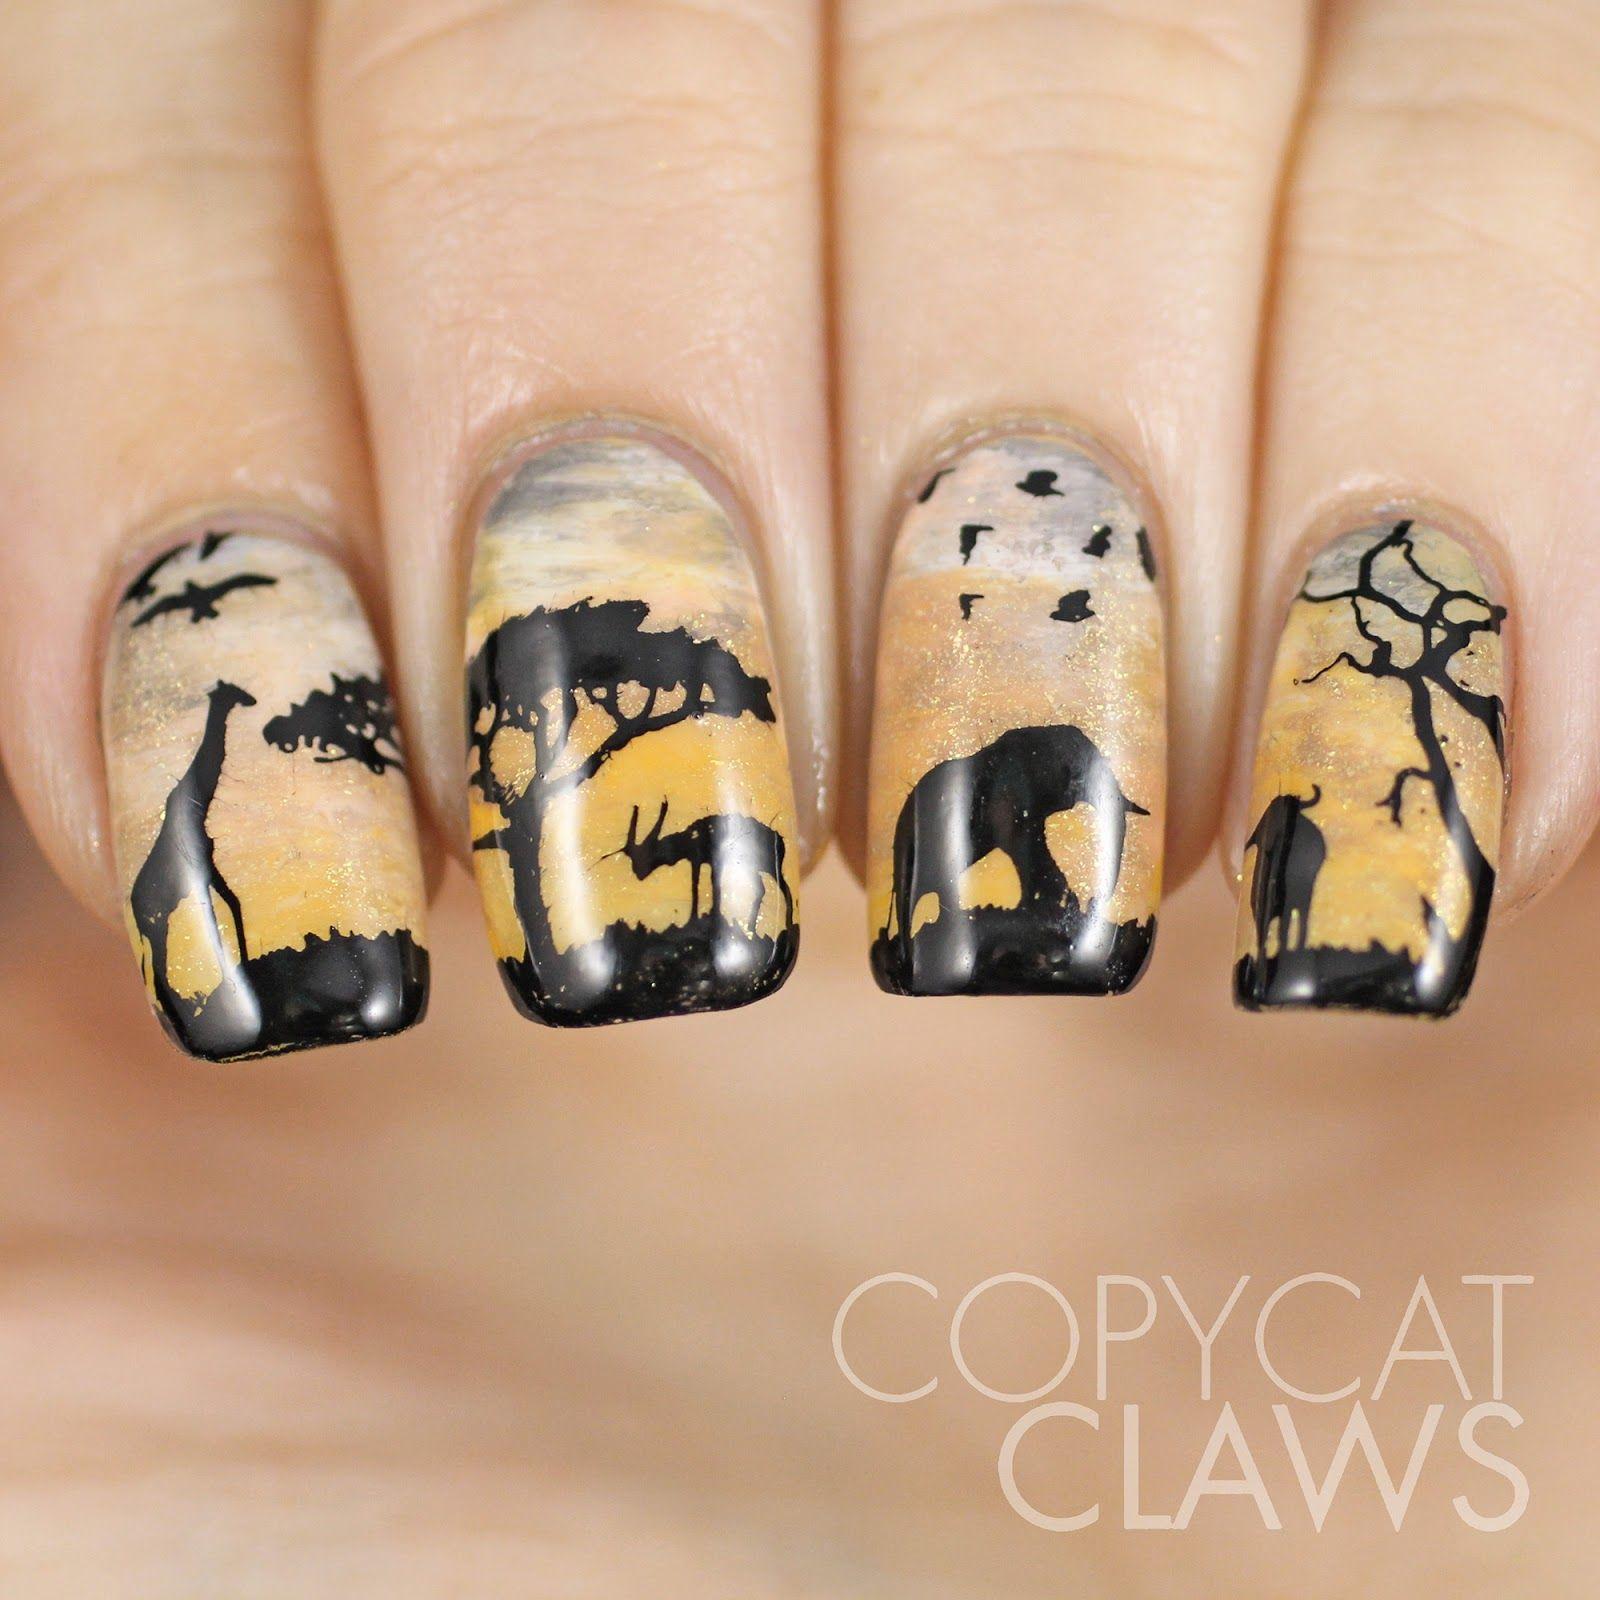 Sunday Stamping - Wildlife Nail Art (Copycat Claws)   Wildlife, Nail ...